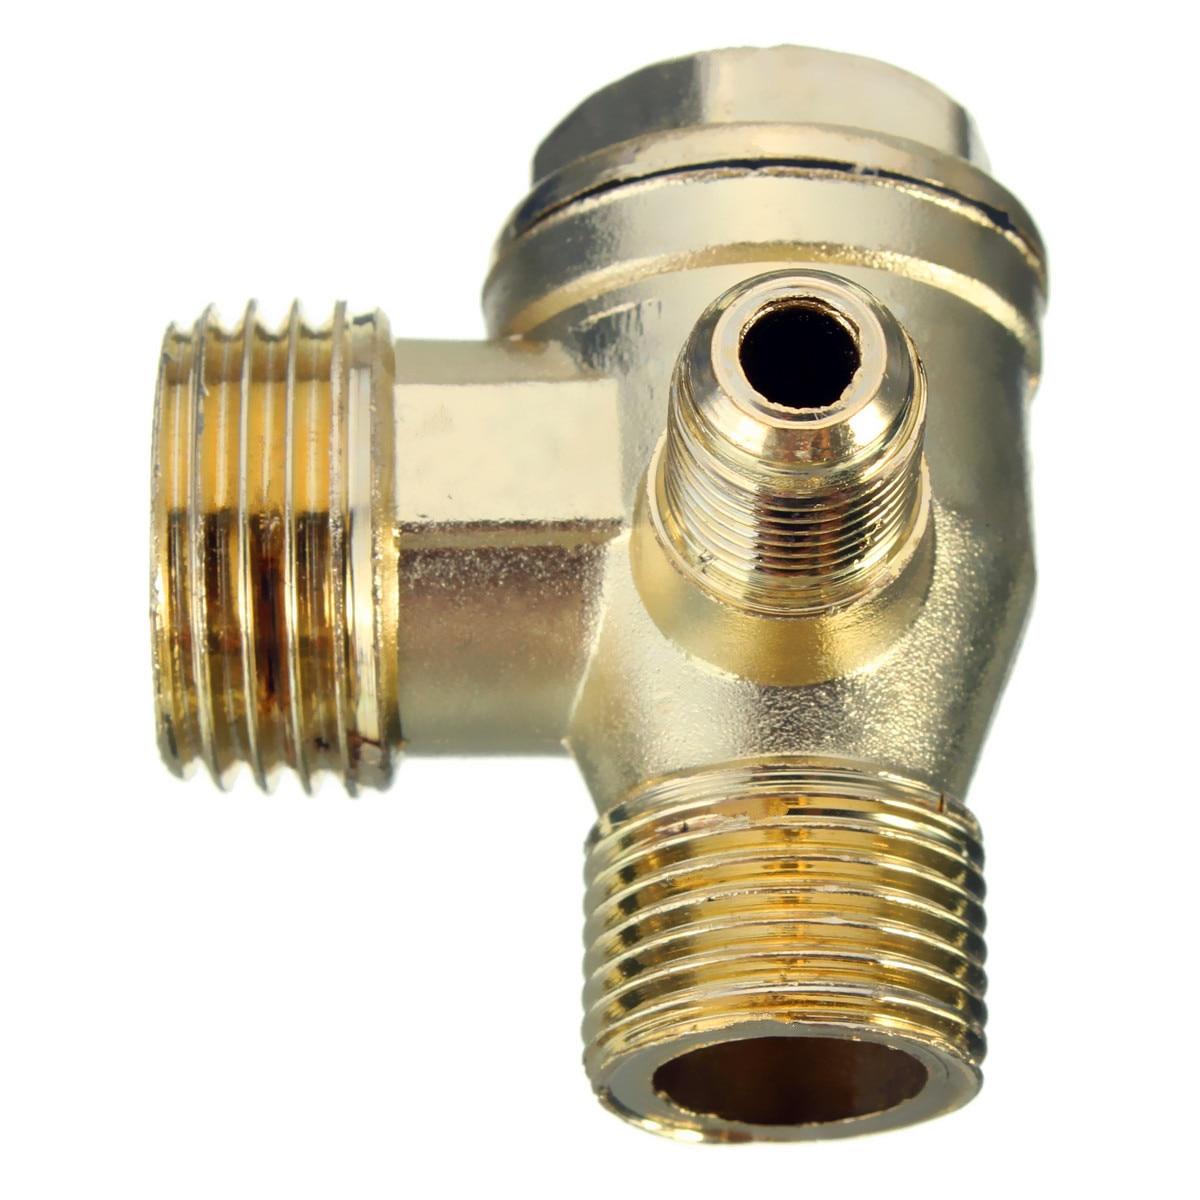 90 Degree Brass Male Threaded Check Valve Miniature Air